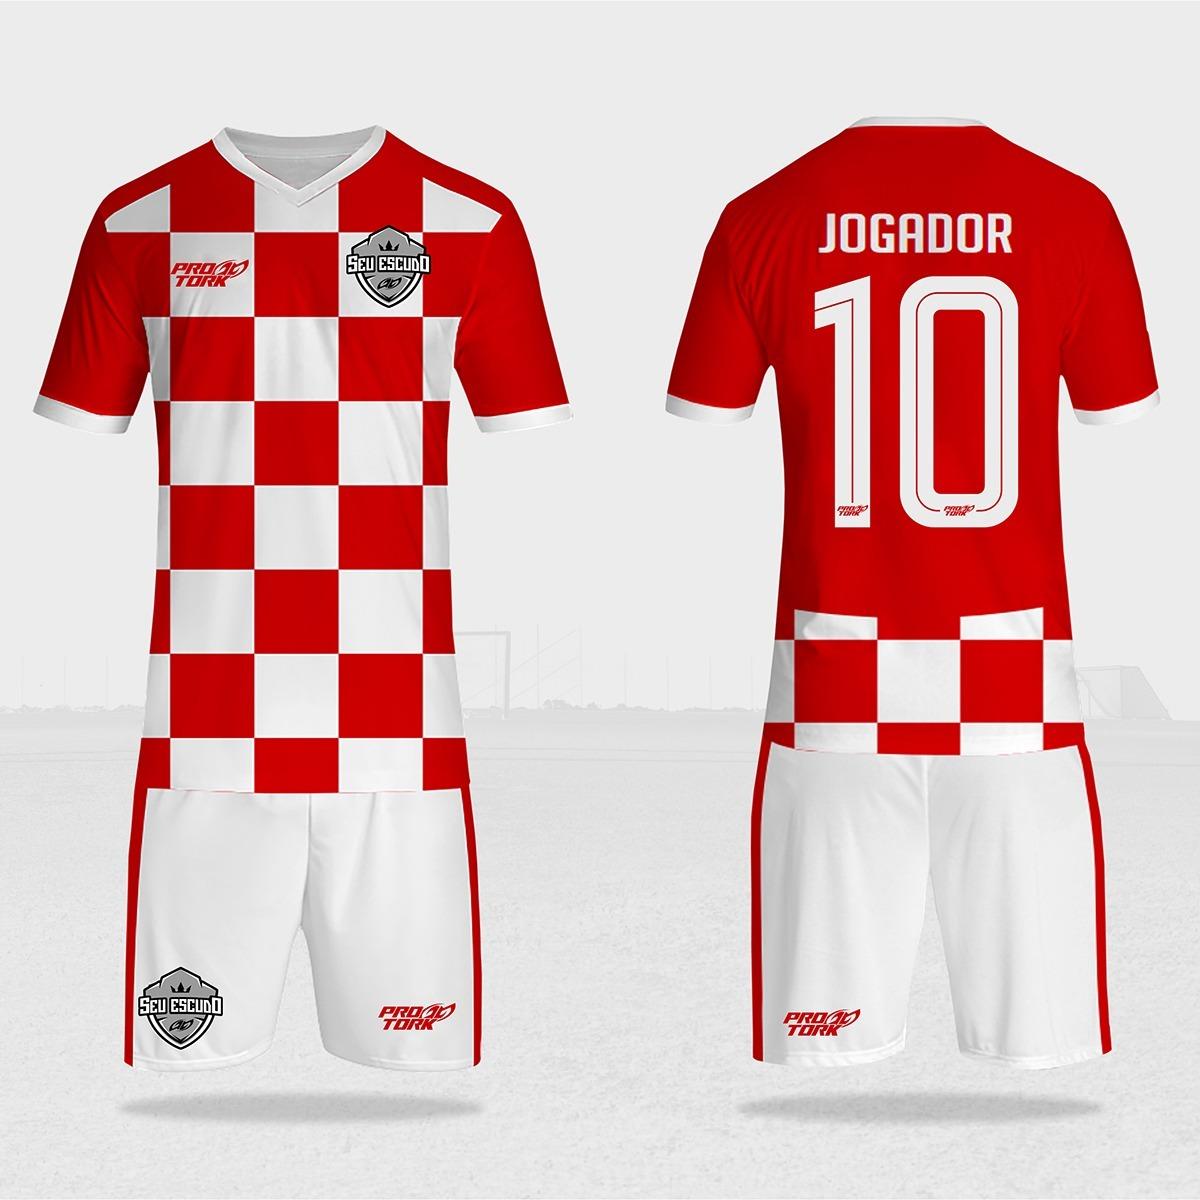 a99d9841d camisa de time personalizada 10un futebol ou futsal. Carregando zoom.